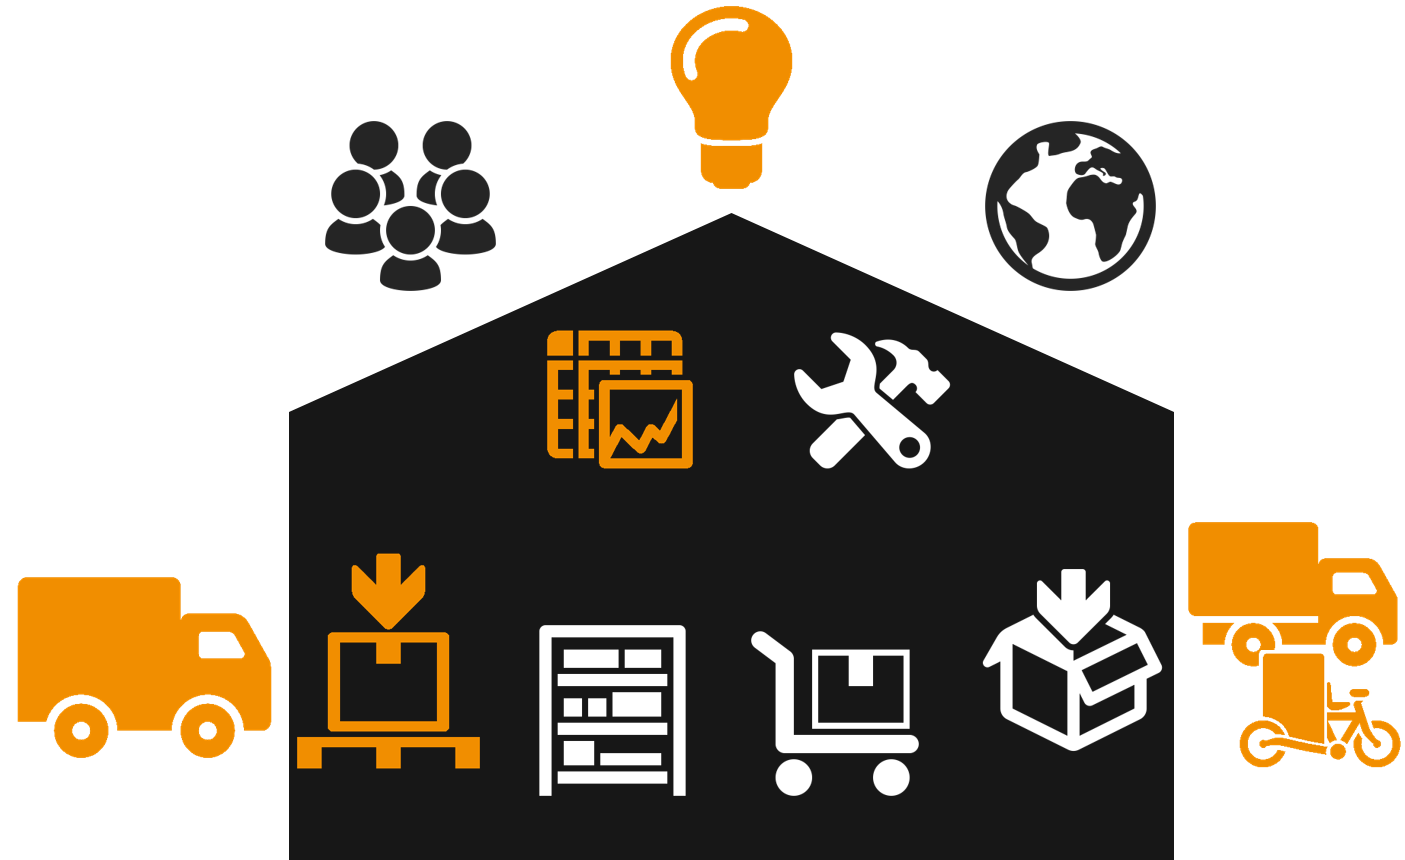 Evaluation clipart procurement process. Connection with the future